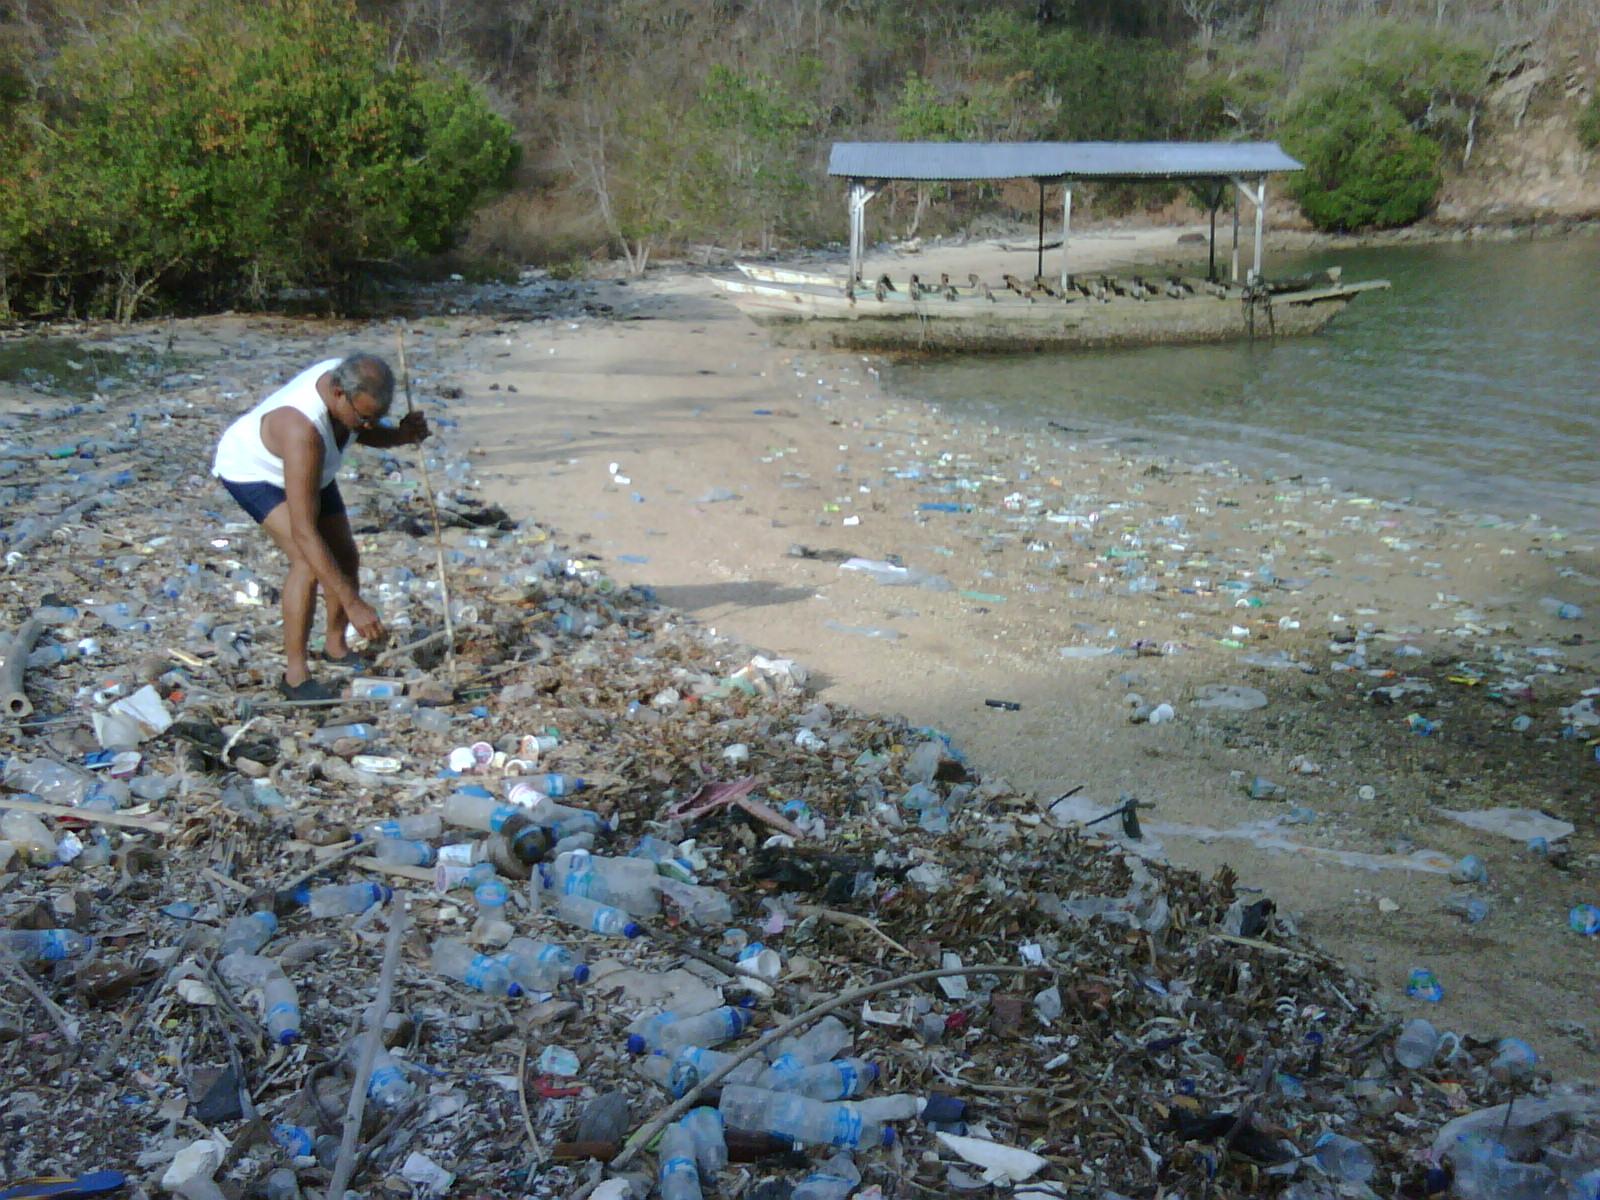 Plastics litter Flores' coastline. Photo courtesy of Stefan Rafael.